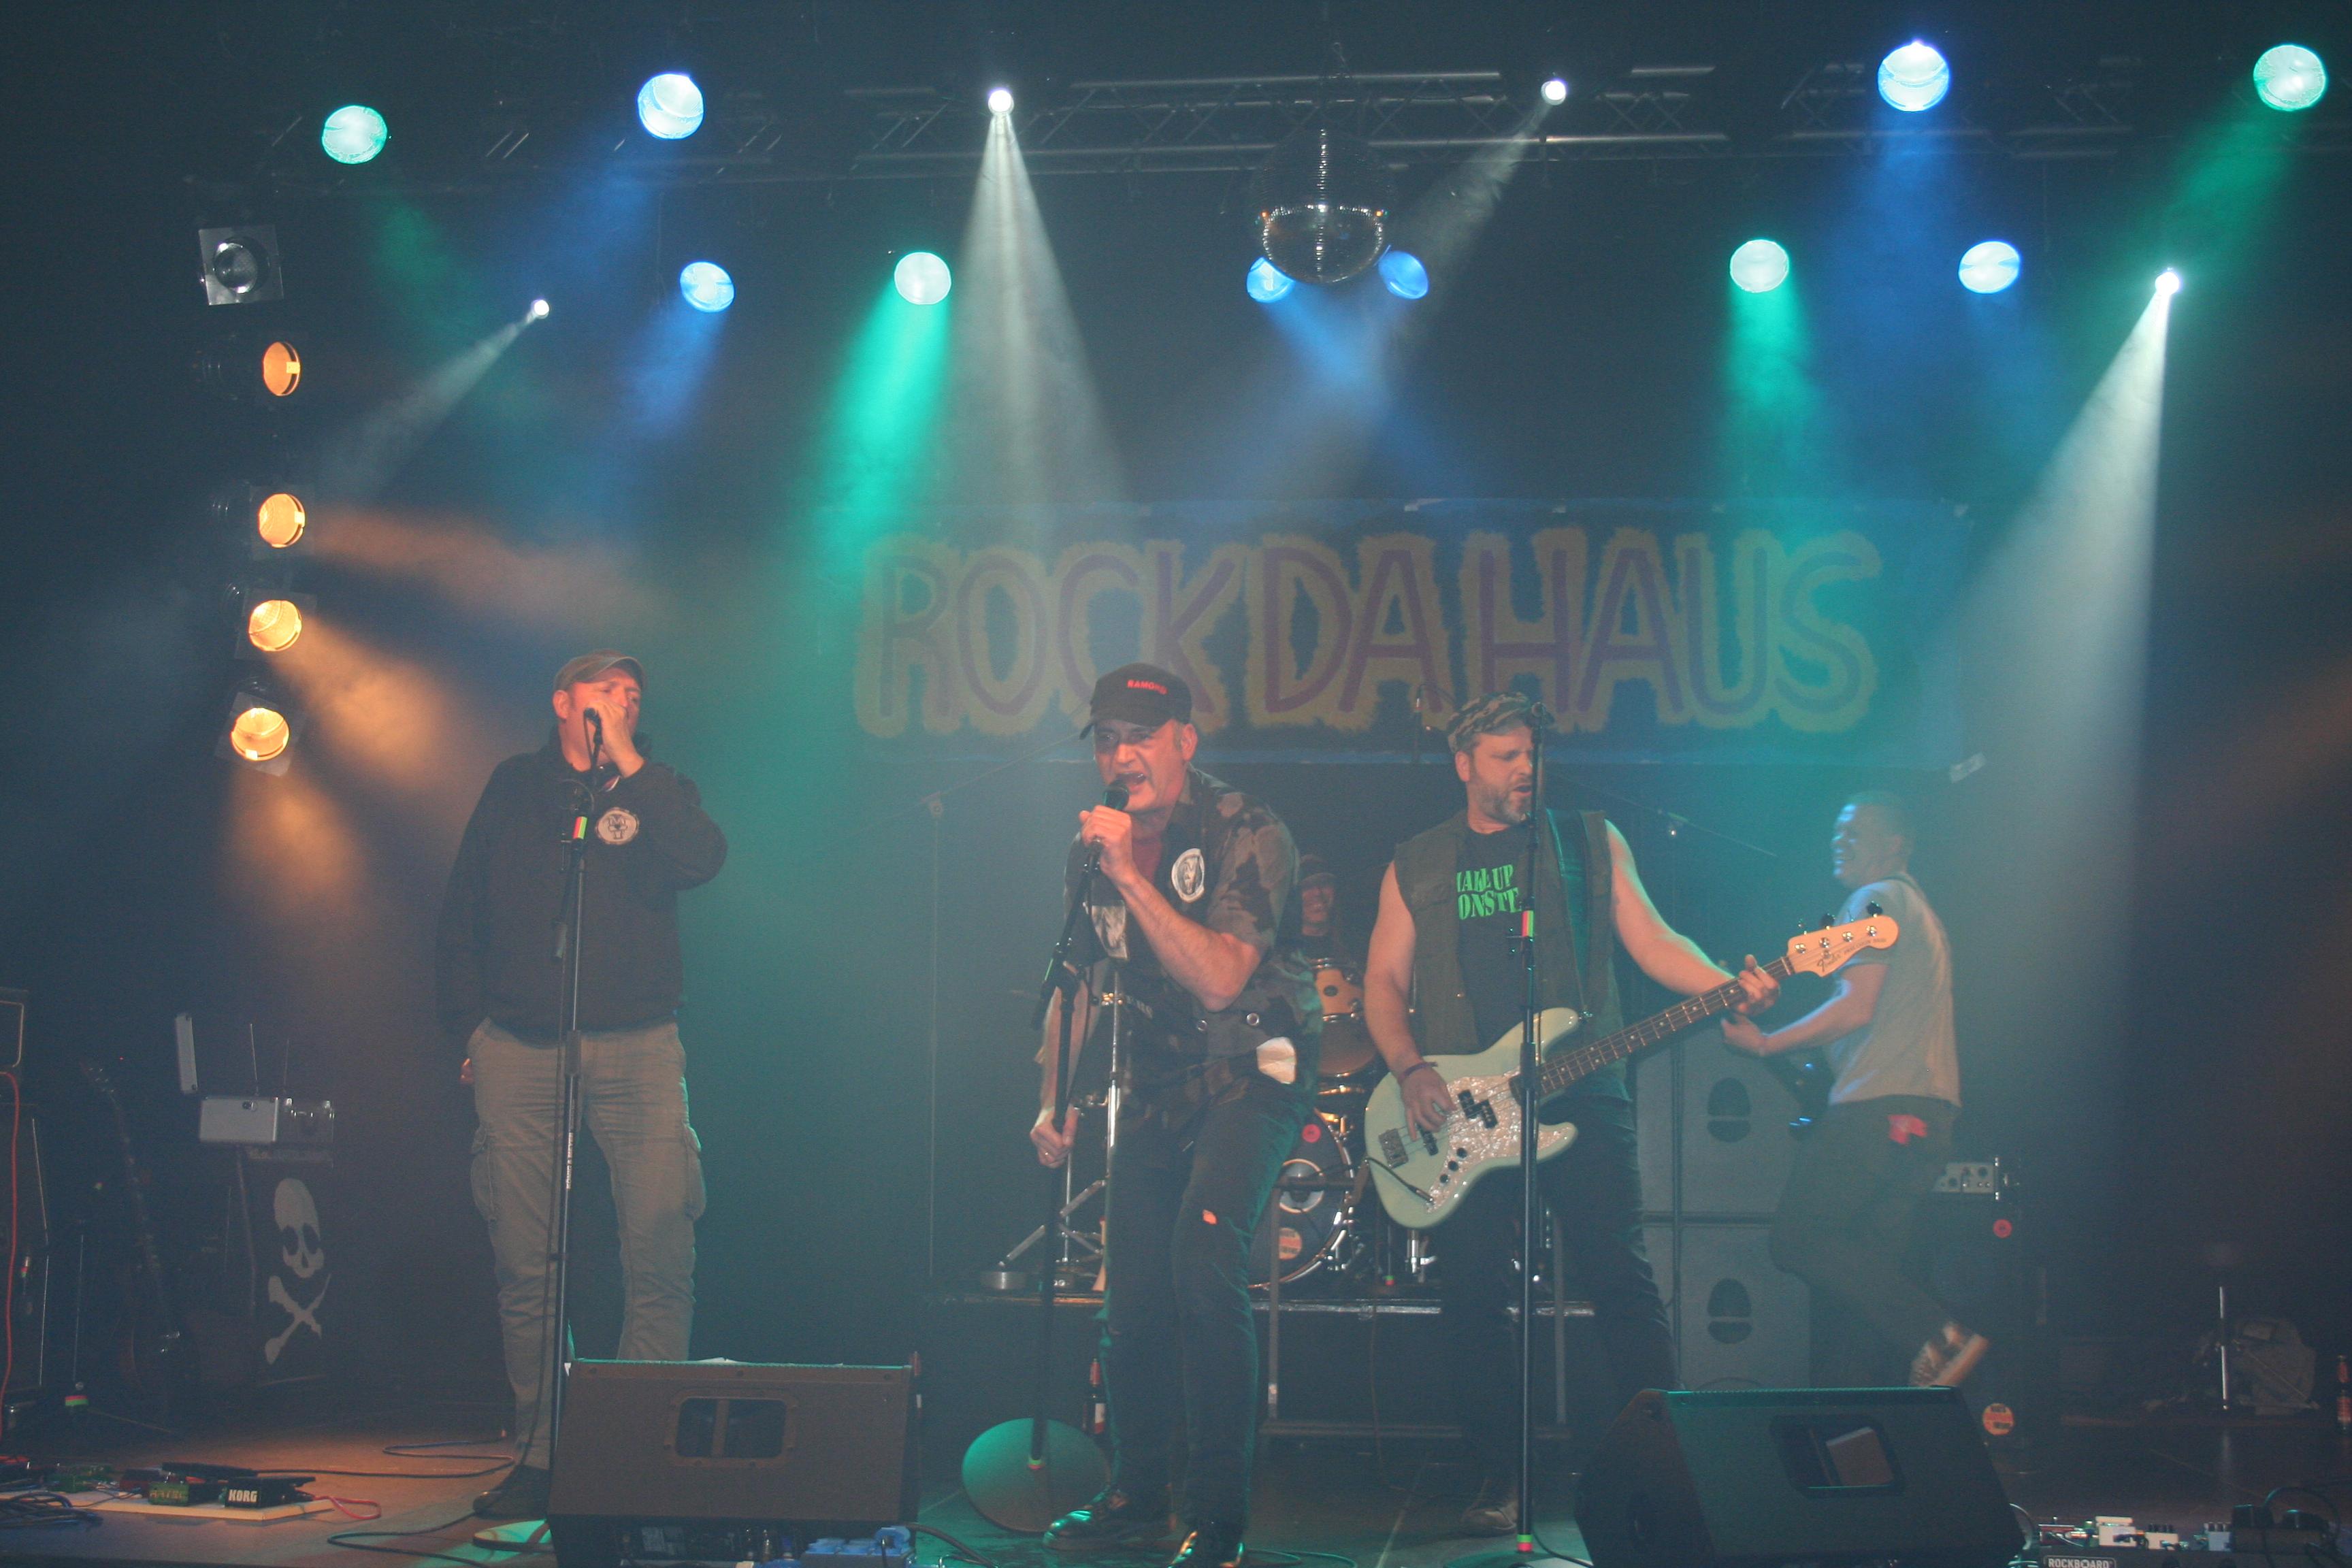 2016-11-26 Rock da Haus 055 - Kopie